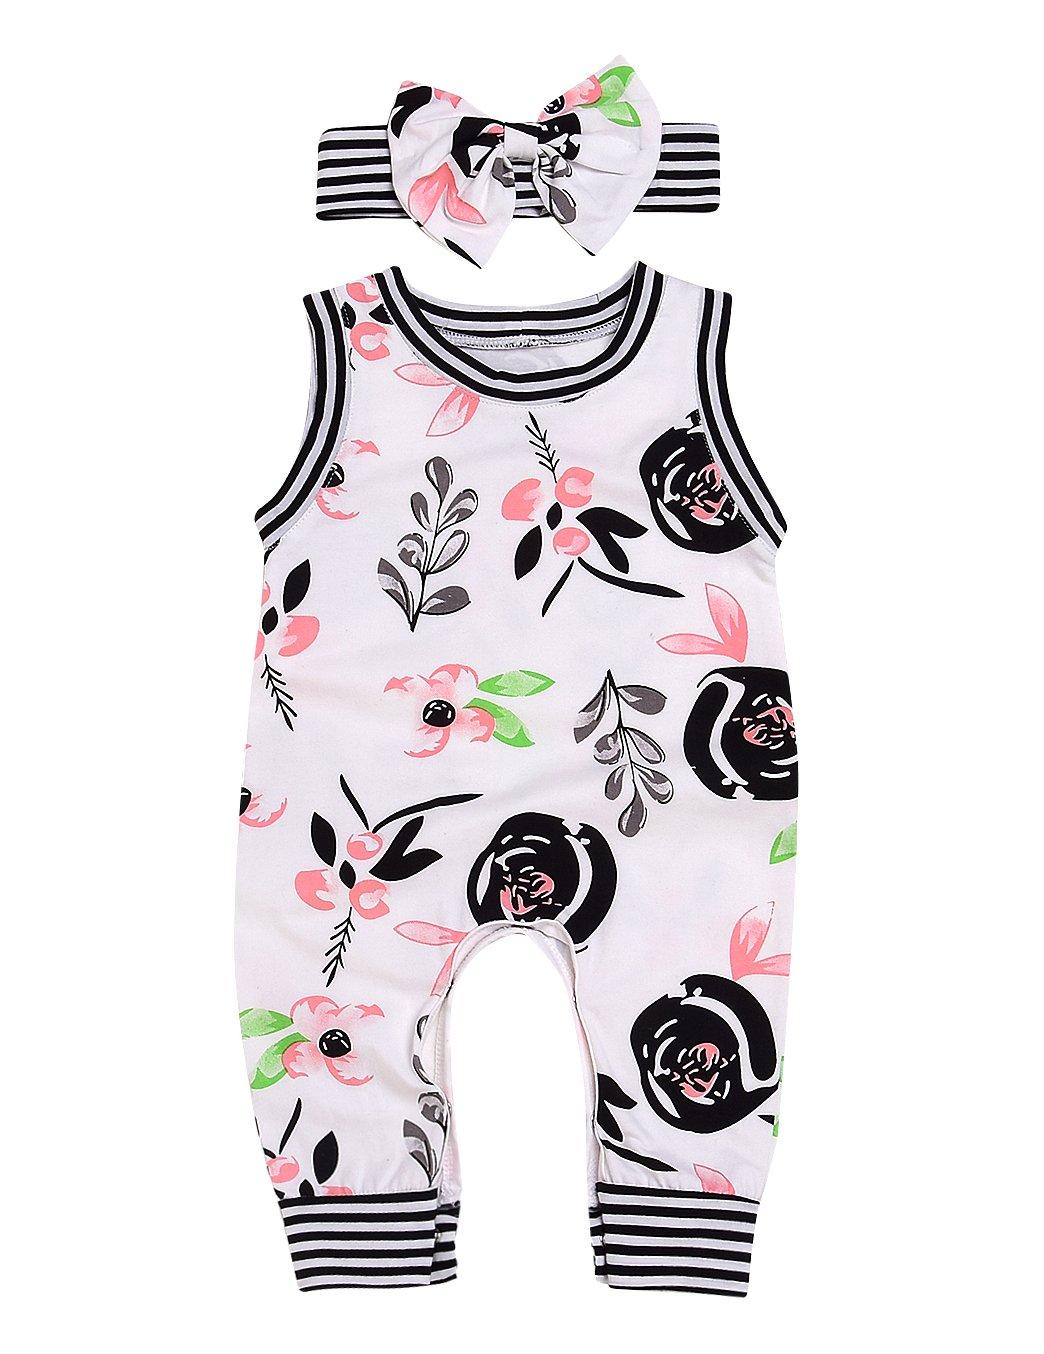 AILOM Newborn Infant Baby Boys Girls Flower Print Stripe Sleeveless Romper Summer Bodysuit Jumpsuit Outfits With Headband (White, 6-12 M)